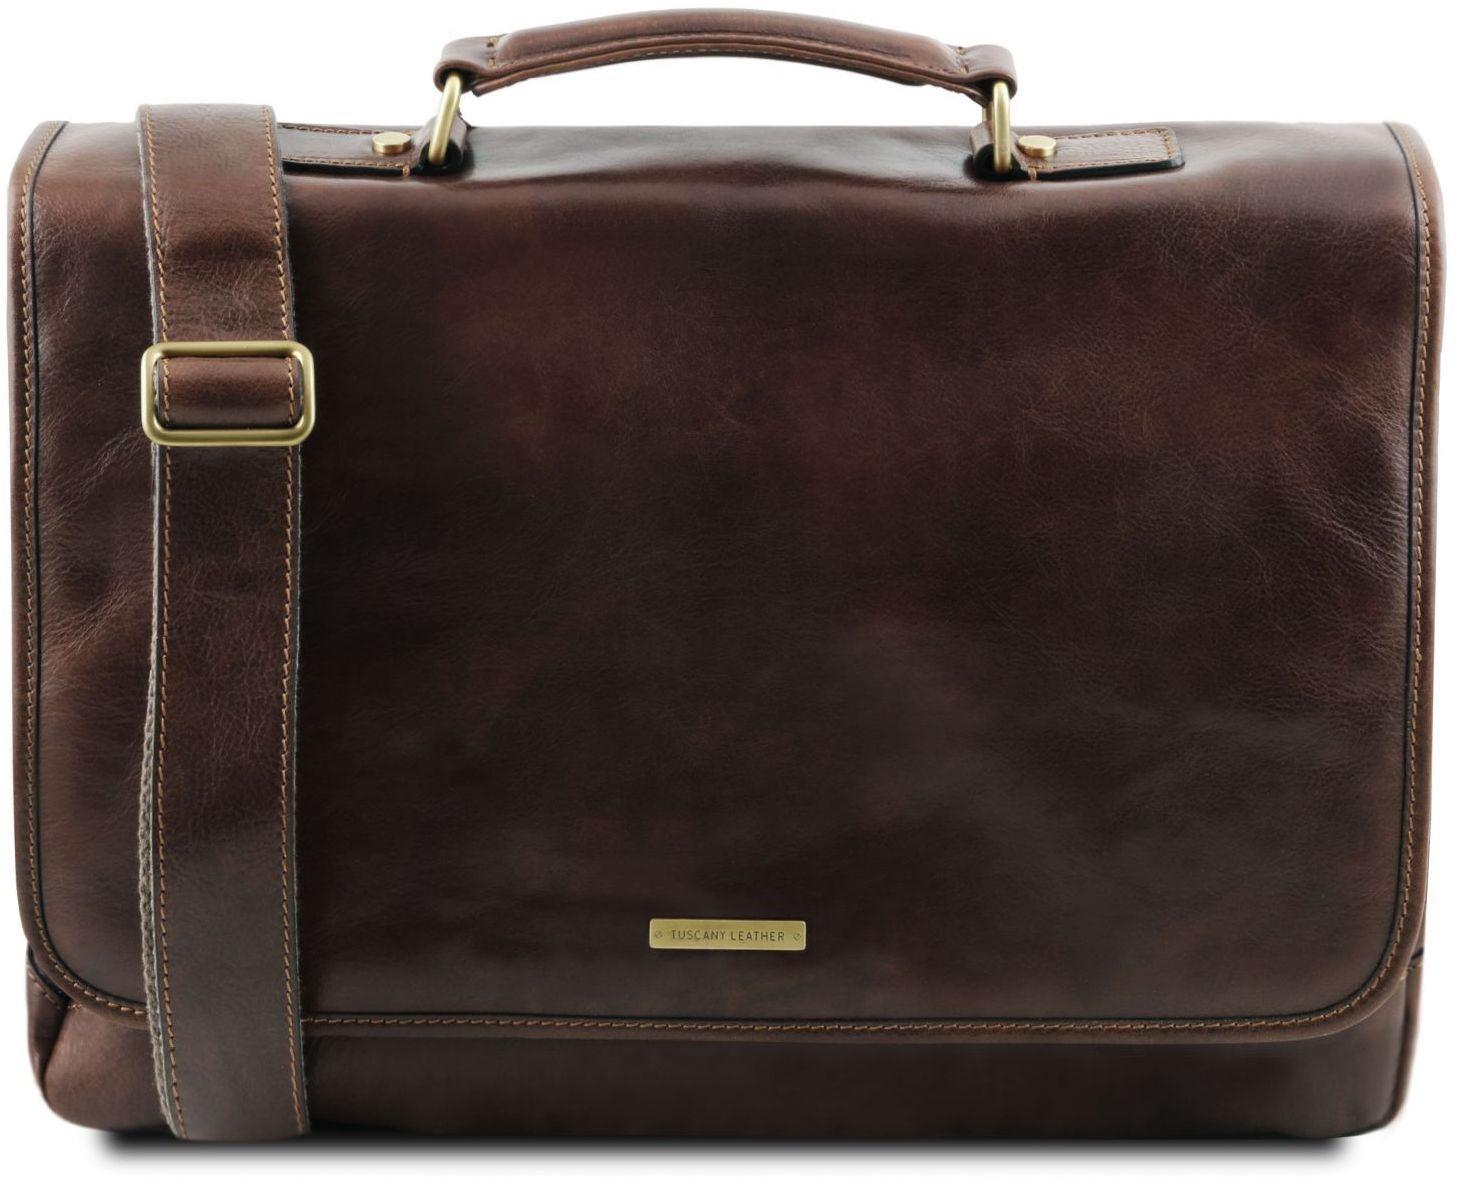 97d7a9e567 Ανδρική Τσάντα Δερμάτινη Mantova με Smart Connect™ Καφέ σκούρο Tuscany  Leather ...